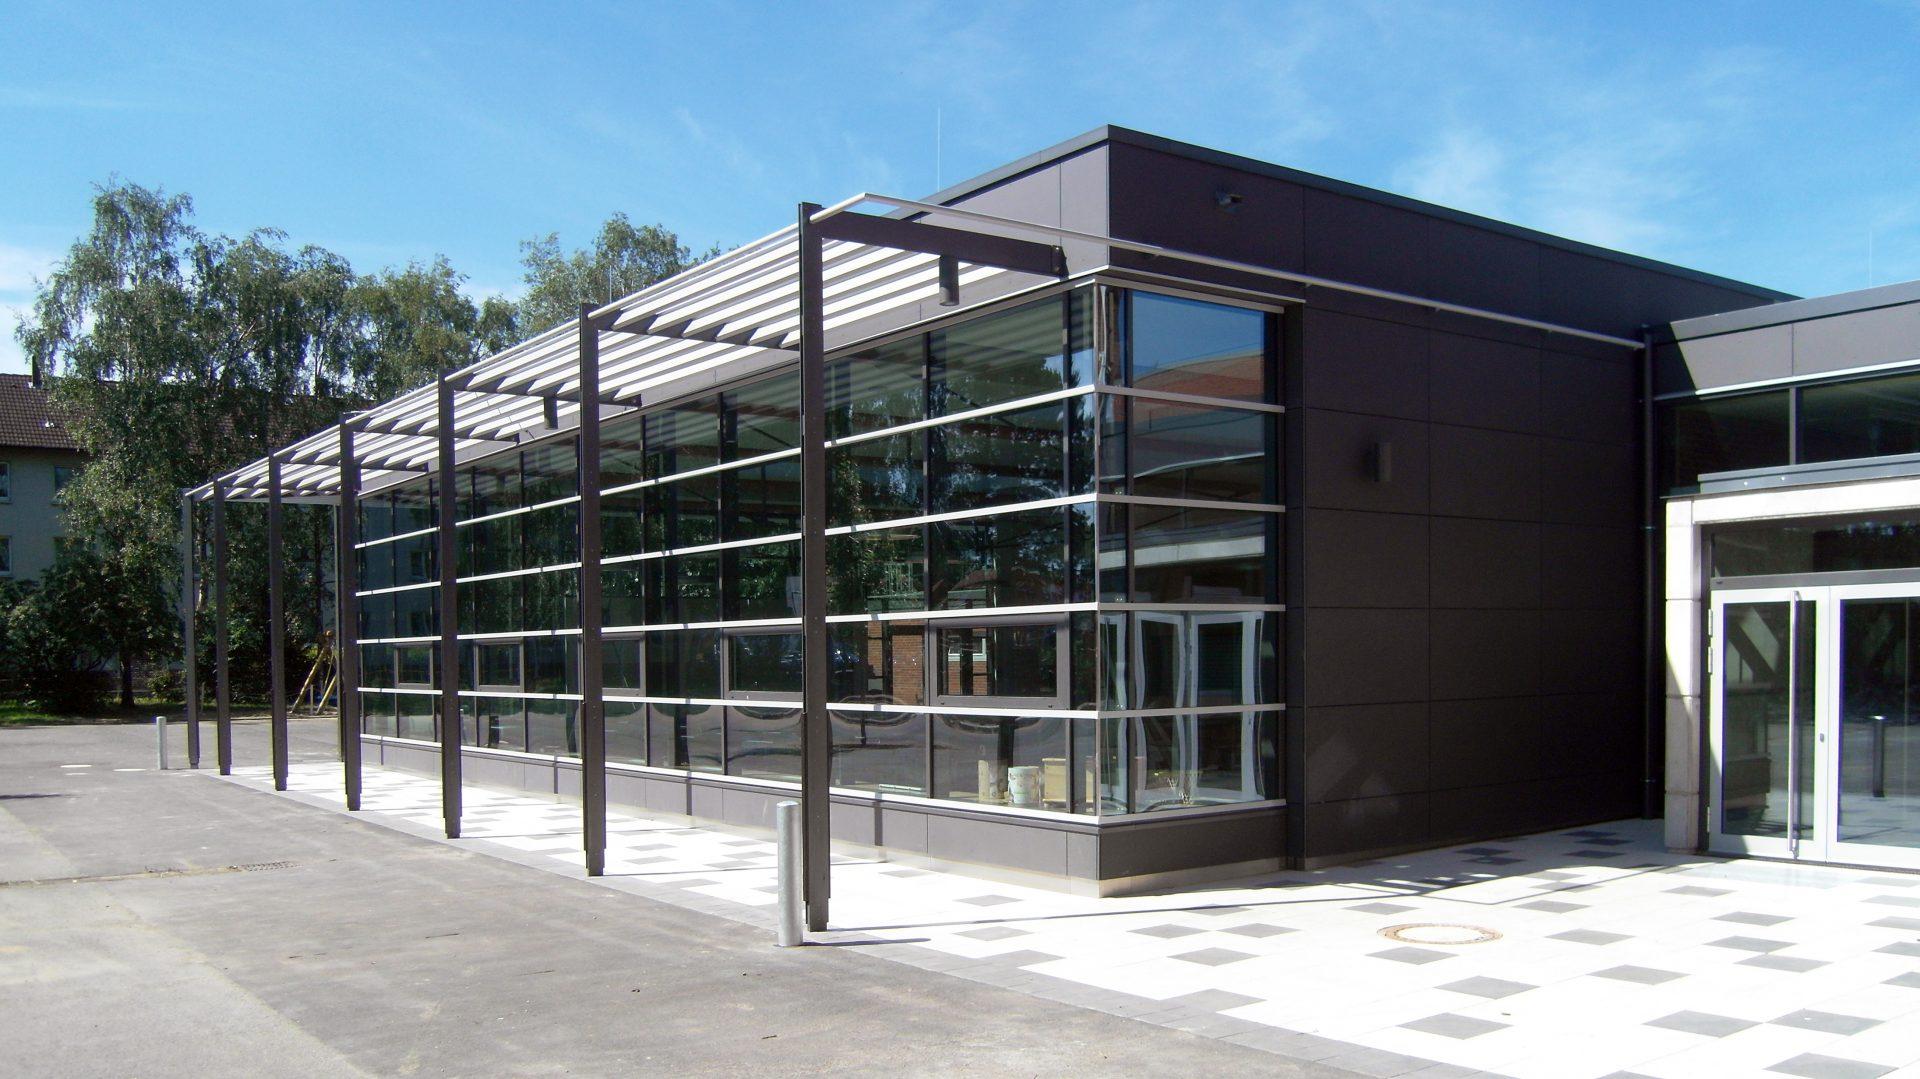 http://www.stricker-architekten.de/projekte/neubau-mensa-grundschule-am-sonnenbrink-stadt-stadthagen/